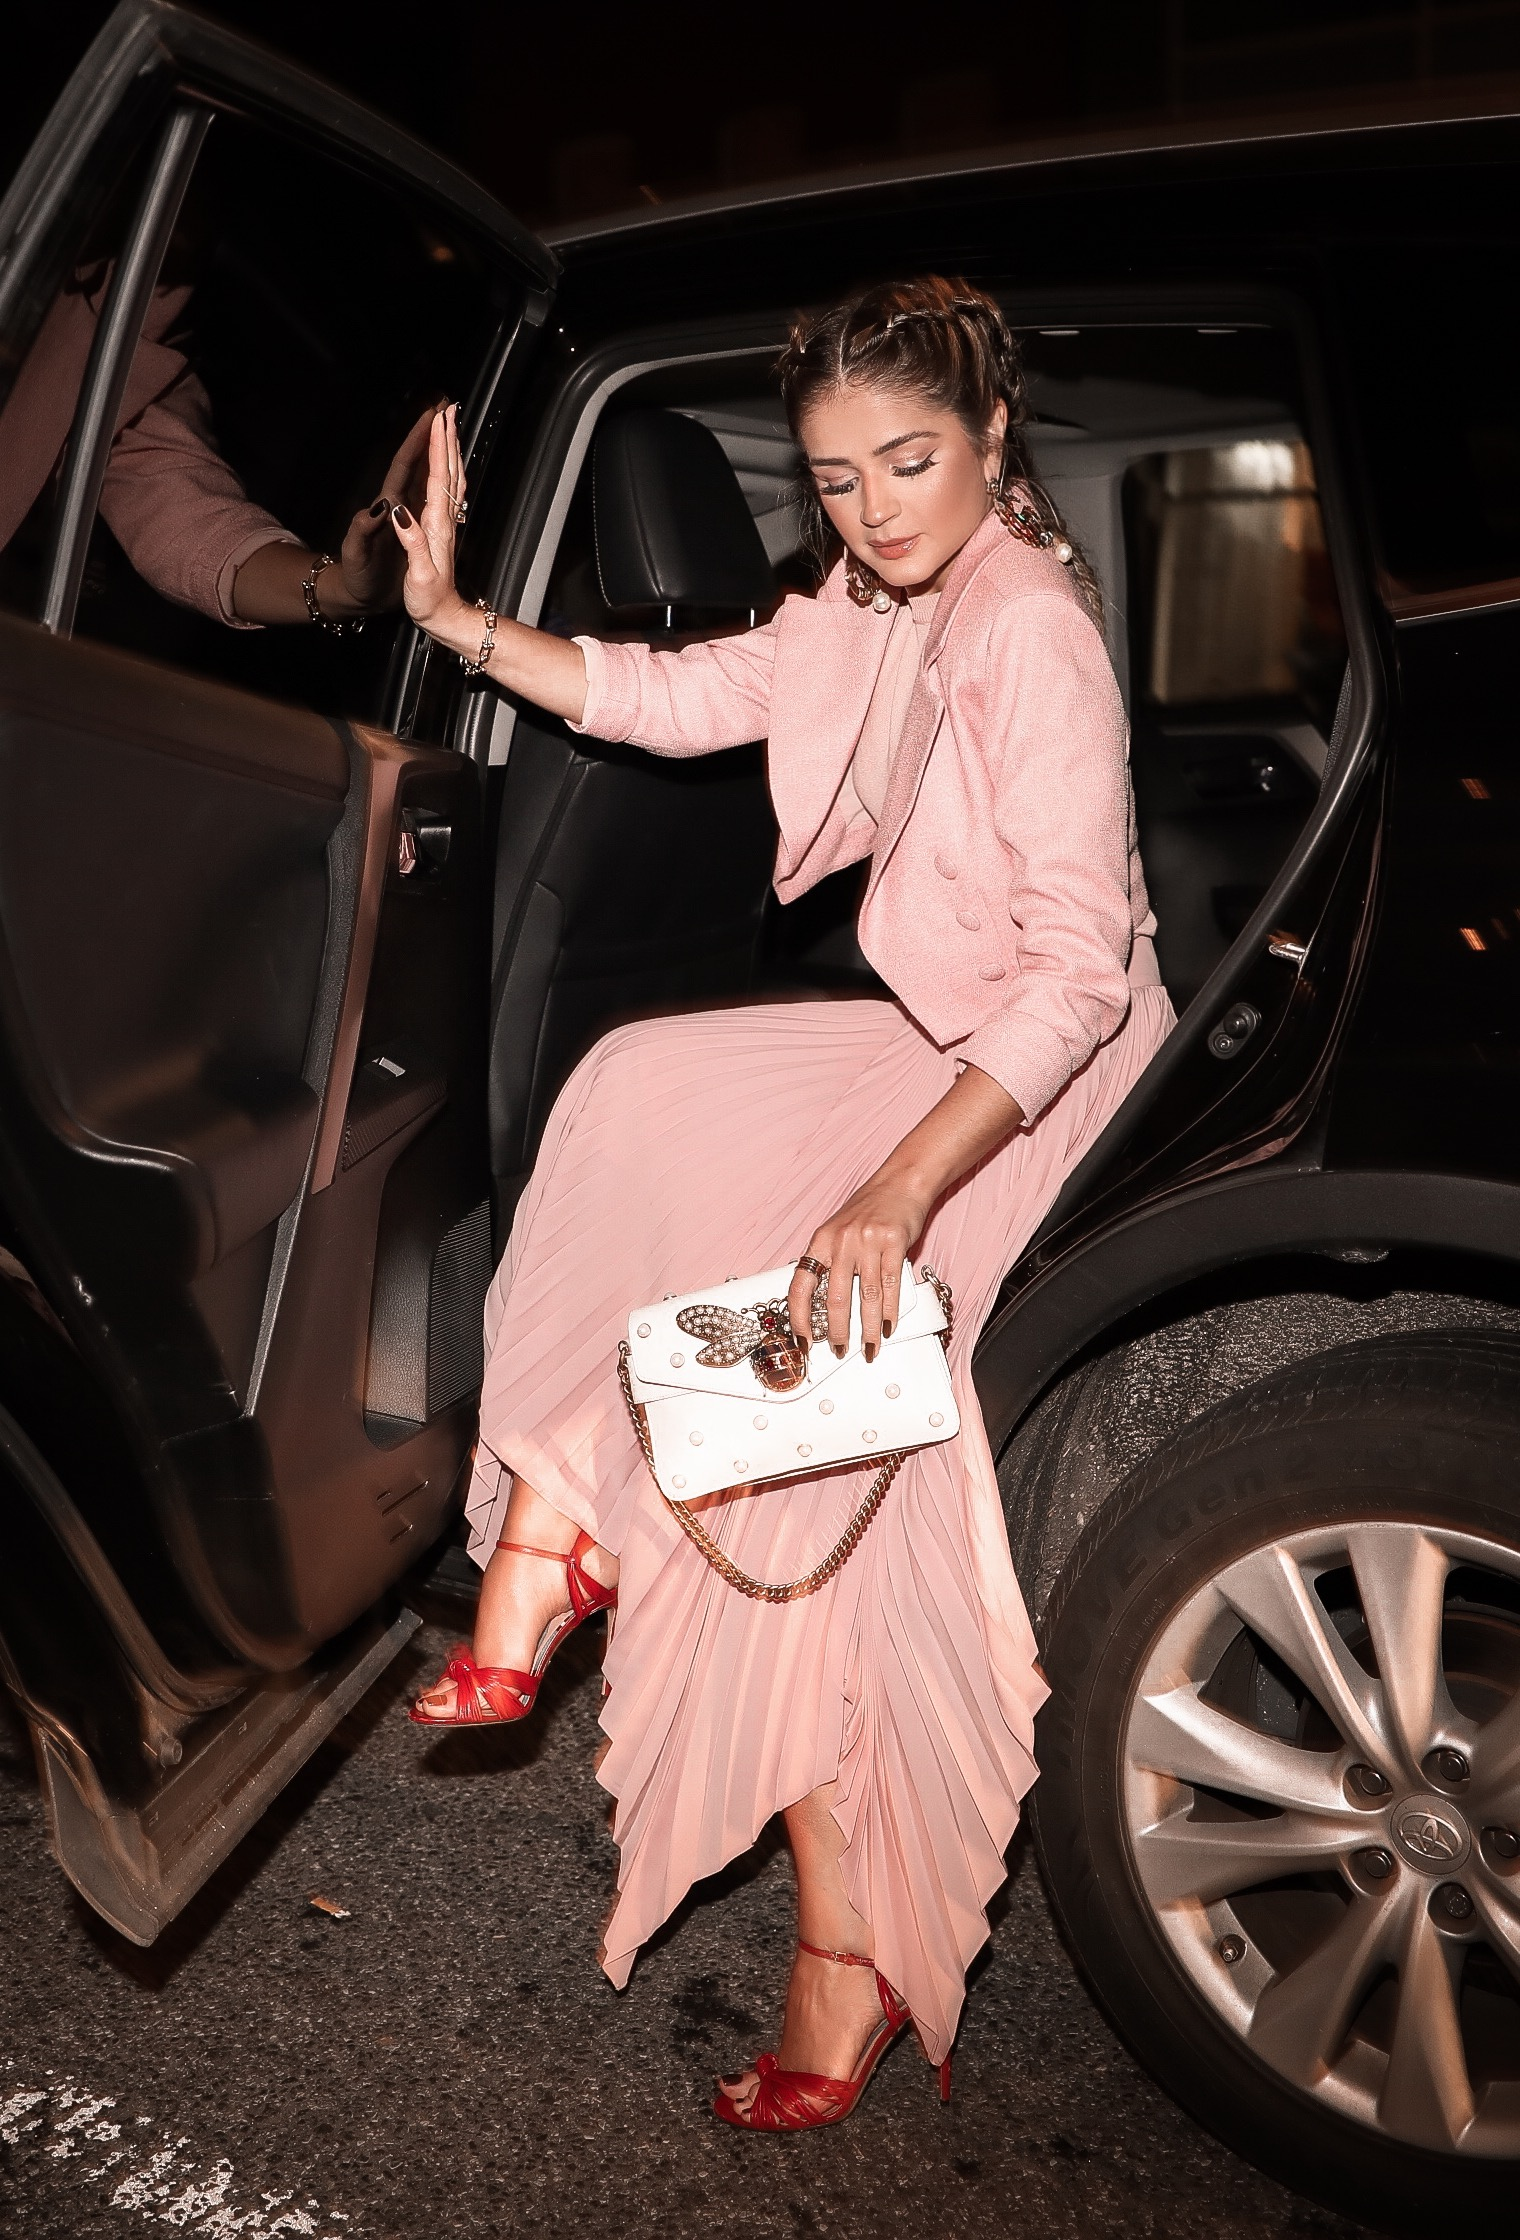 Thassia de rosa iorane NY 8